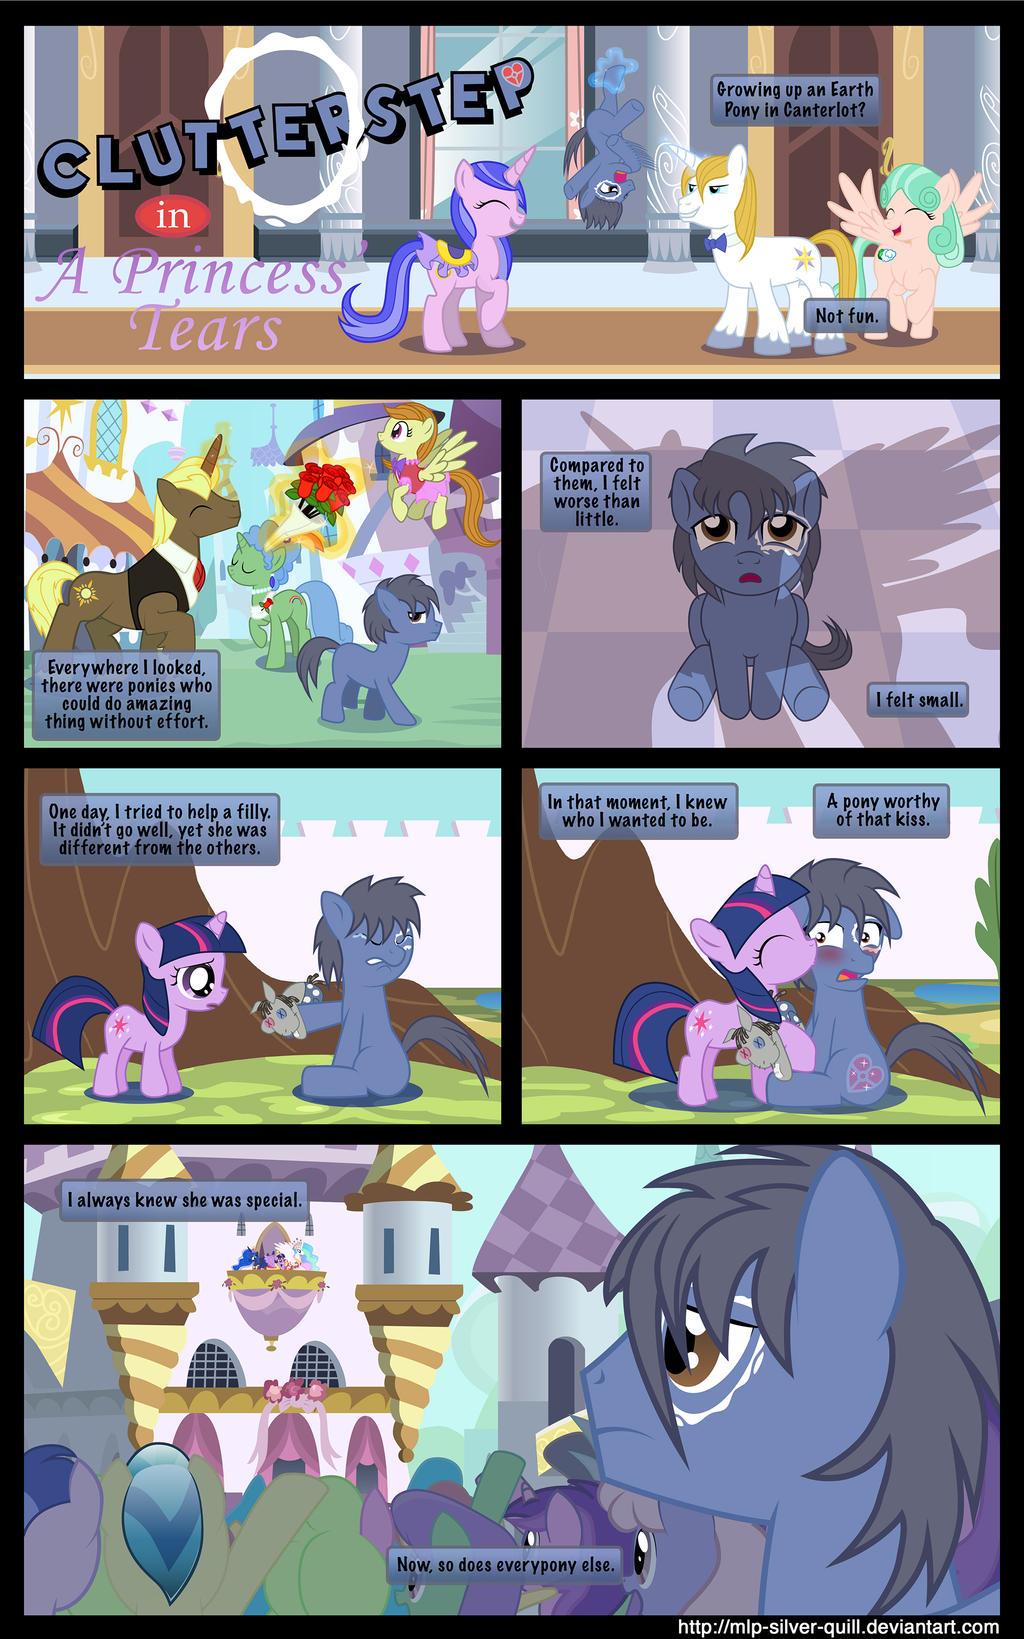 A Princess' Tears - Part 1